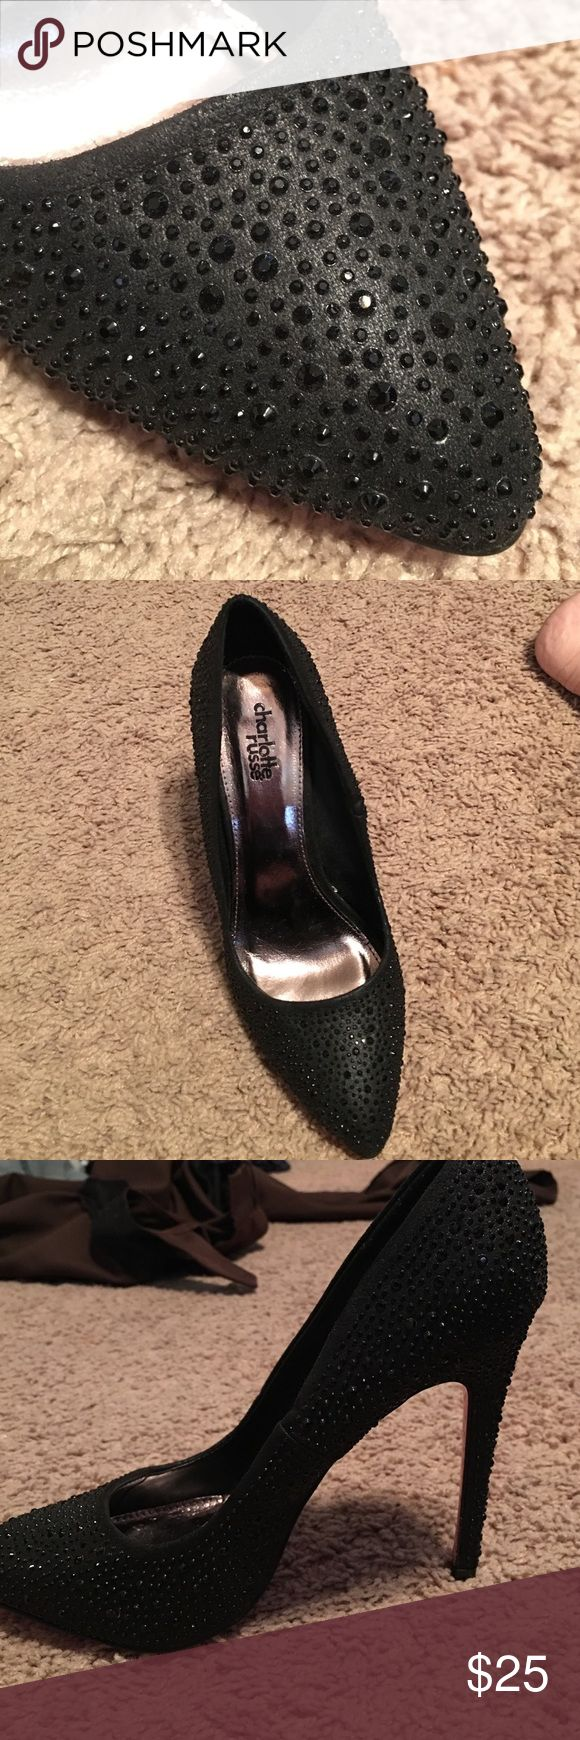 Black rhinestone stilettos! Gorgeous black rhinestone stilettos! Perfect for parties, prom, homecoming, Vegas, etc... impulse buy, never worn, size 8 Charlotte Russe Shoes Heels